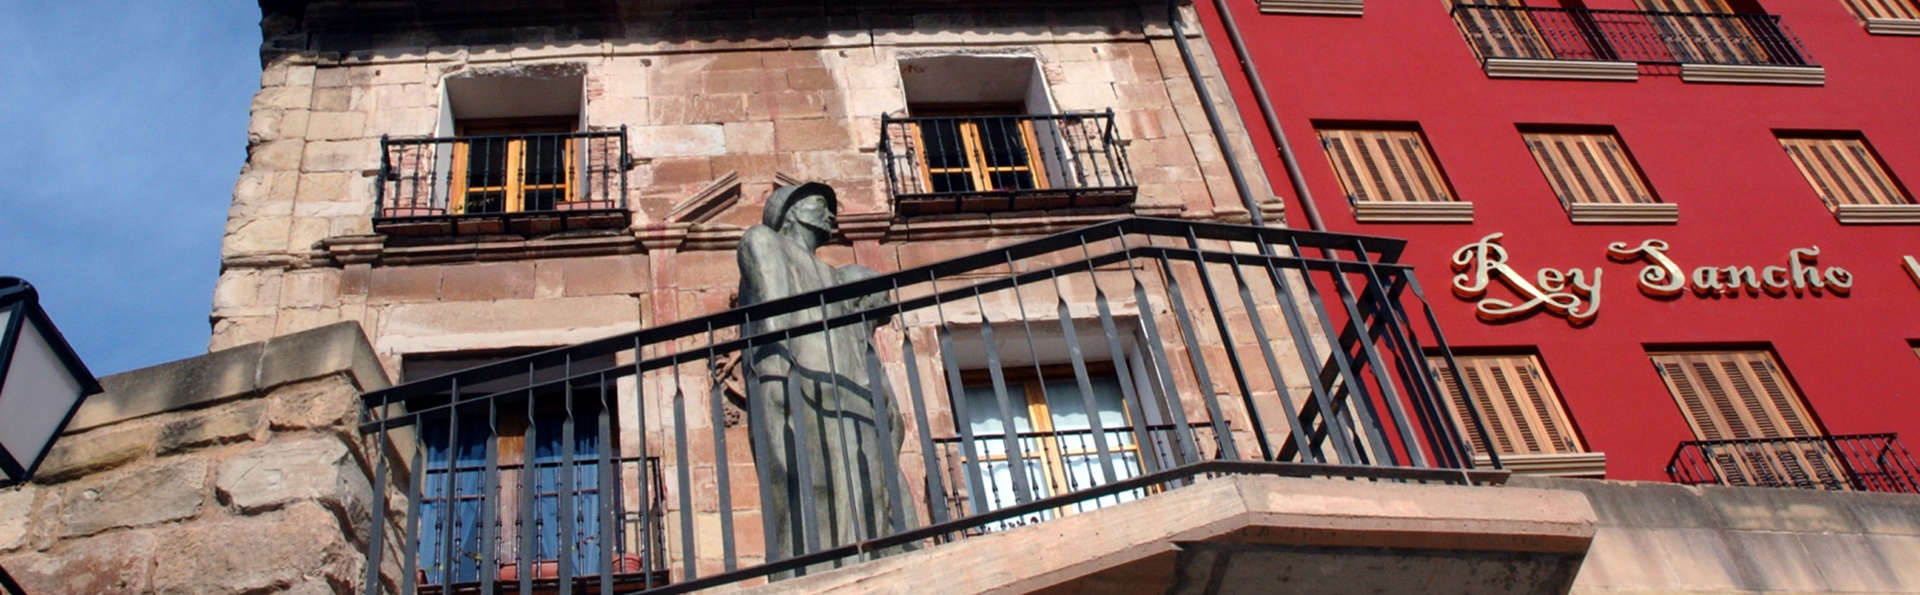 Hotel Rey Sancho - EDIT_front.jpg